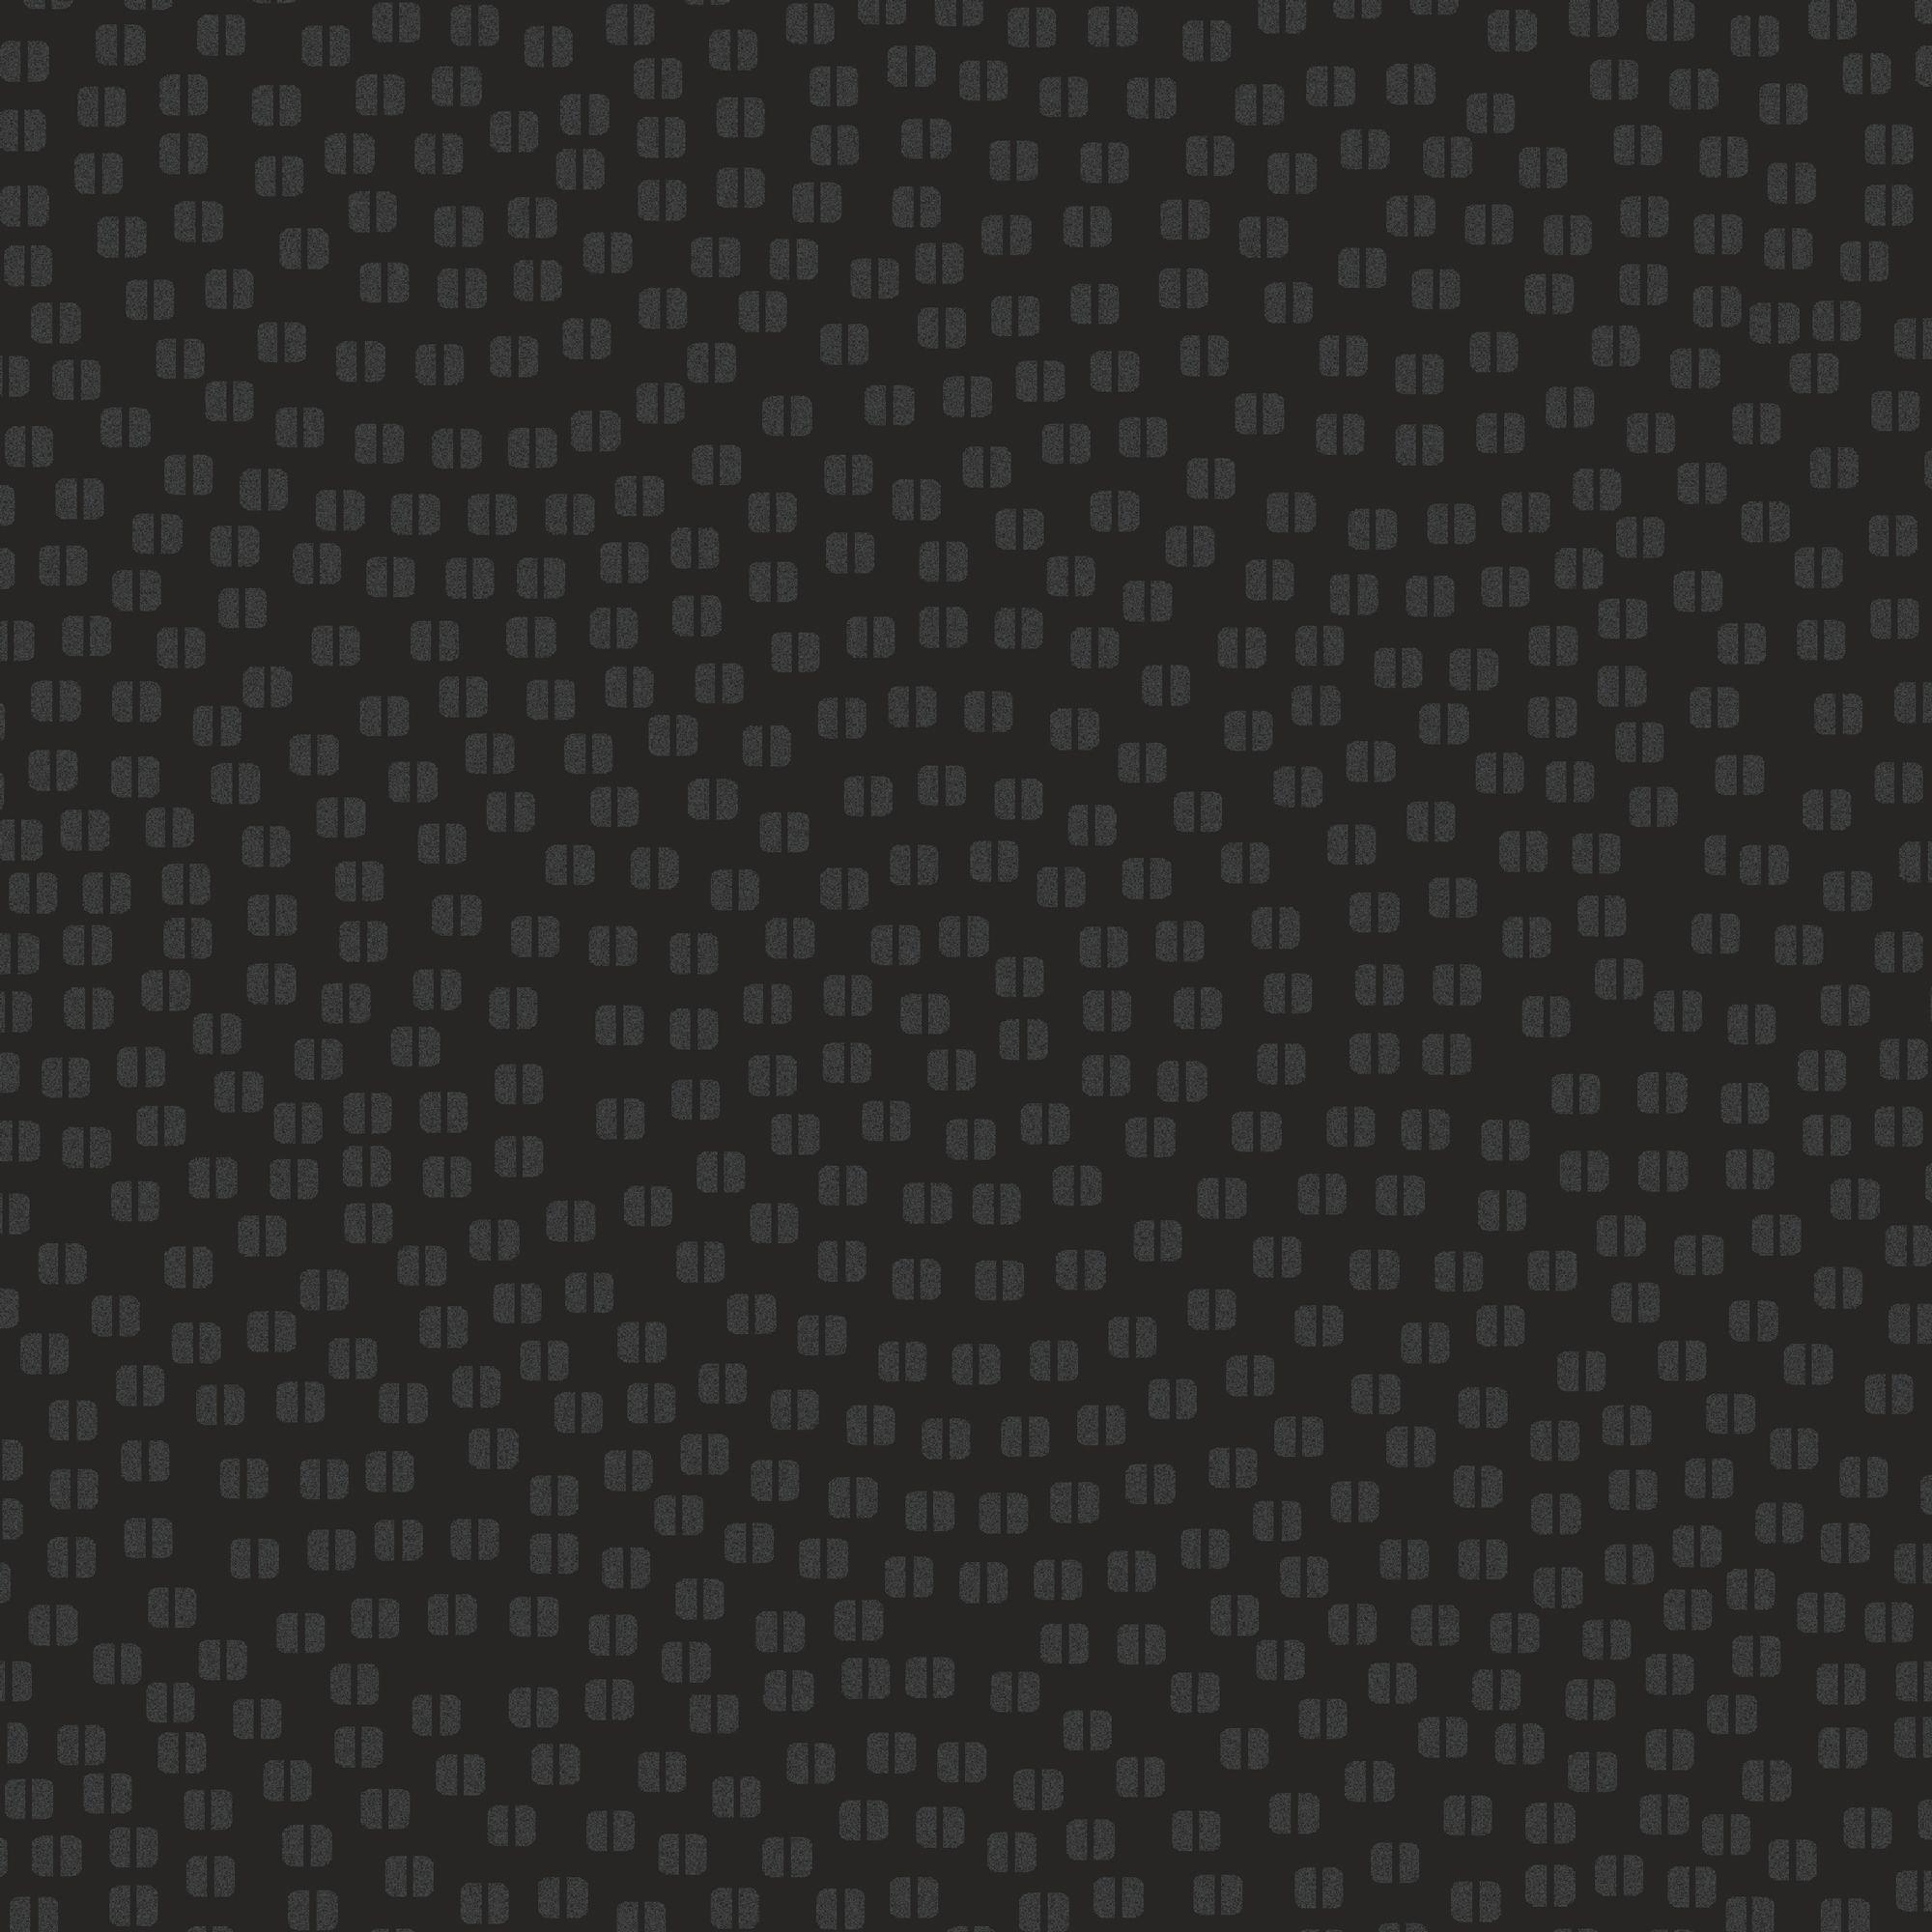 Floor mats b q - Oklahoma Circle Black Glitter Effect Wallpaper Departments Diy At B Q